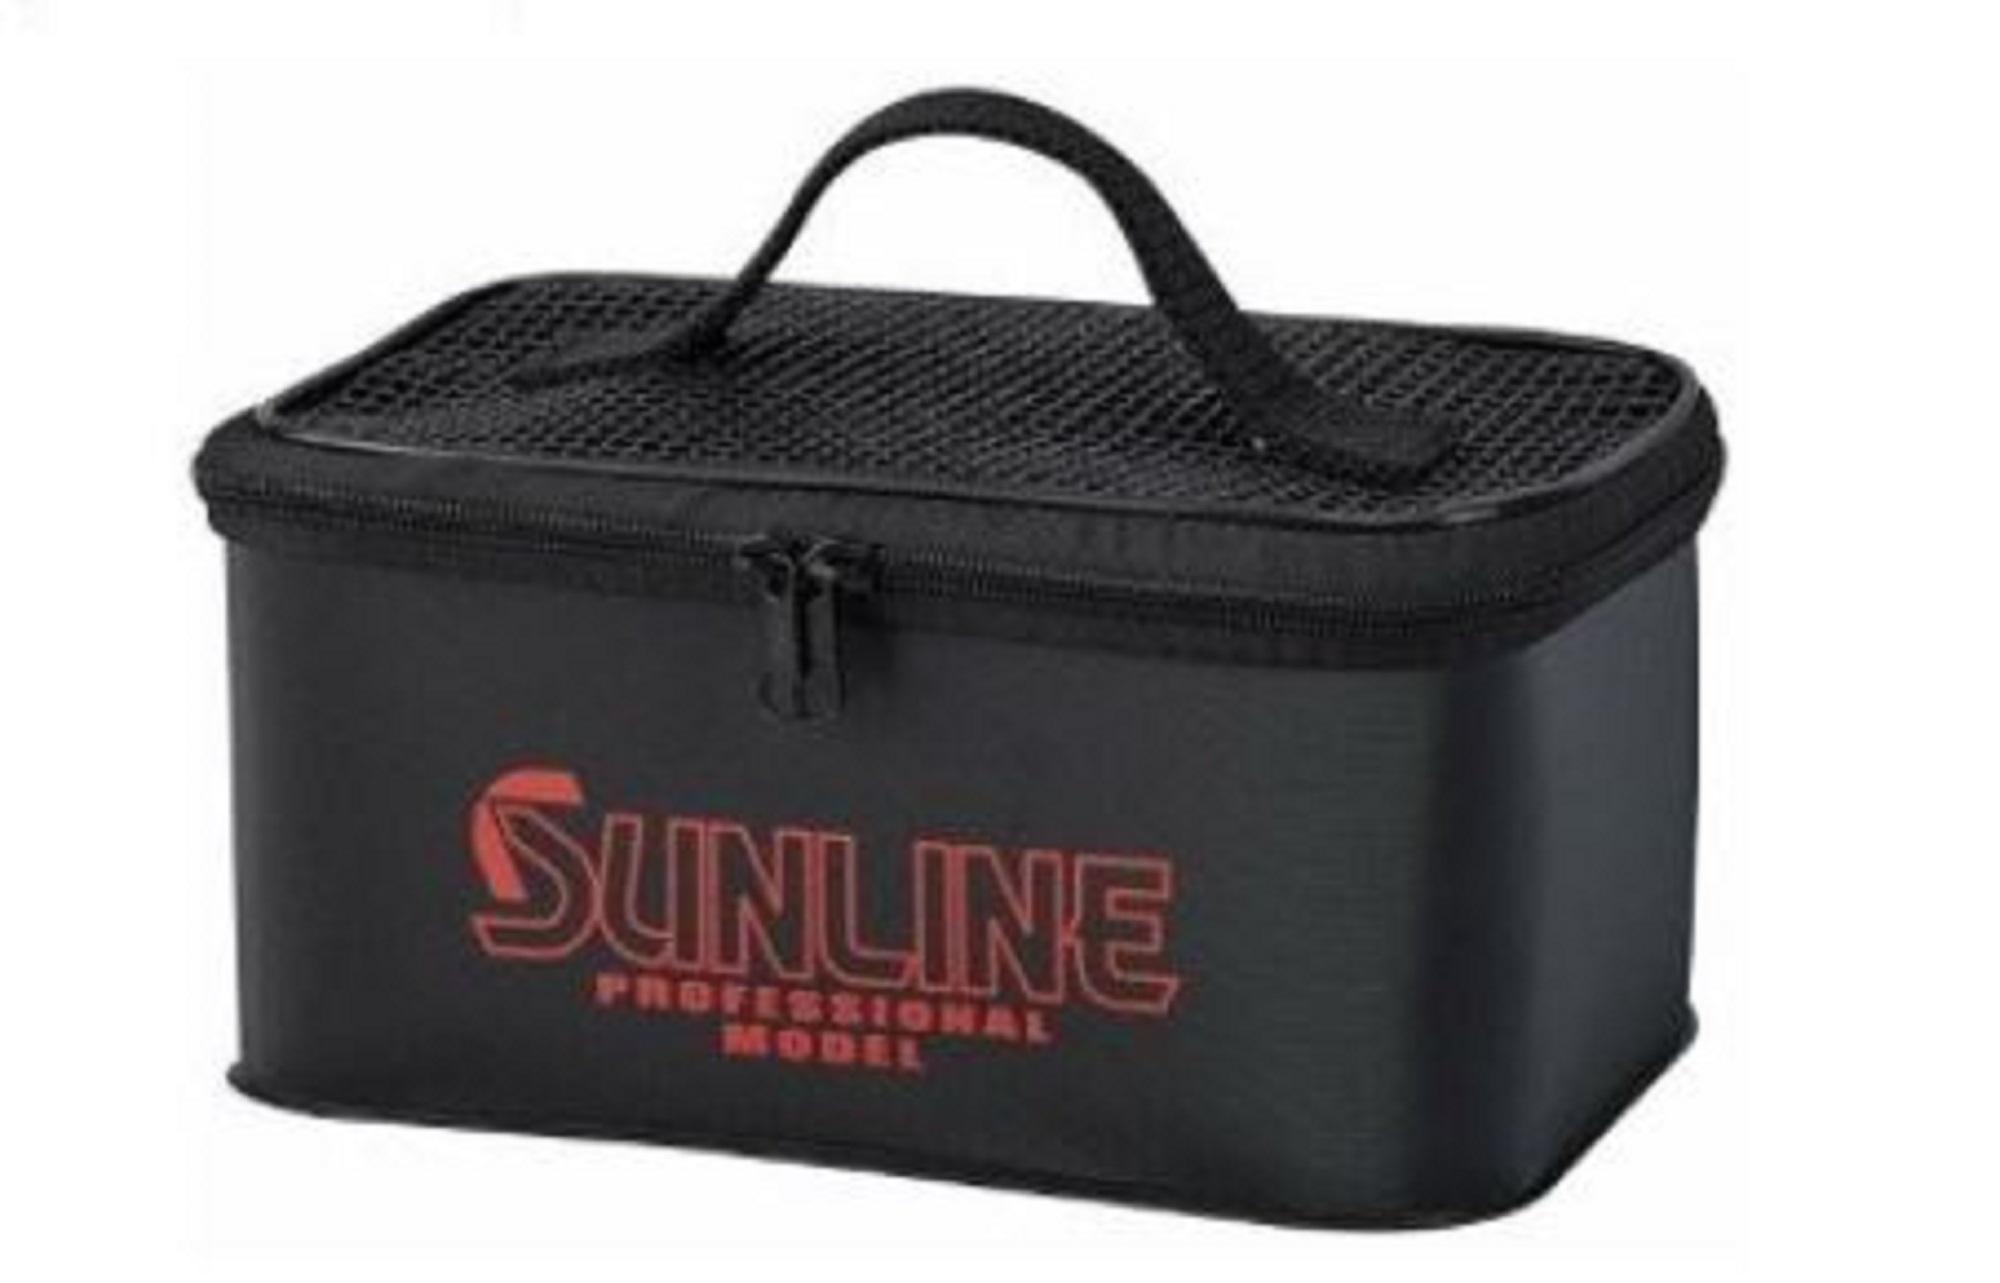 Sunline SFB-107 Mesh Zip Box Drainable 220 x 155 x 105mm Black Size S (3928)